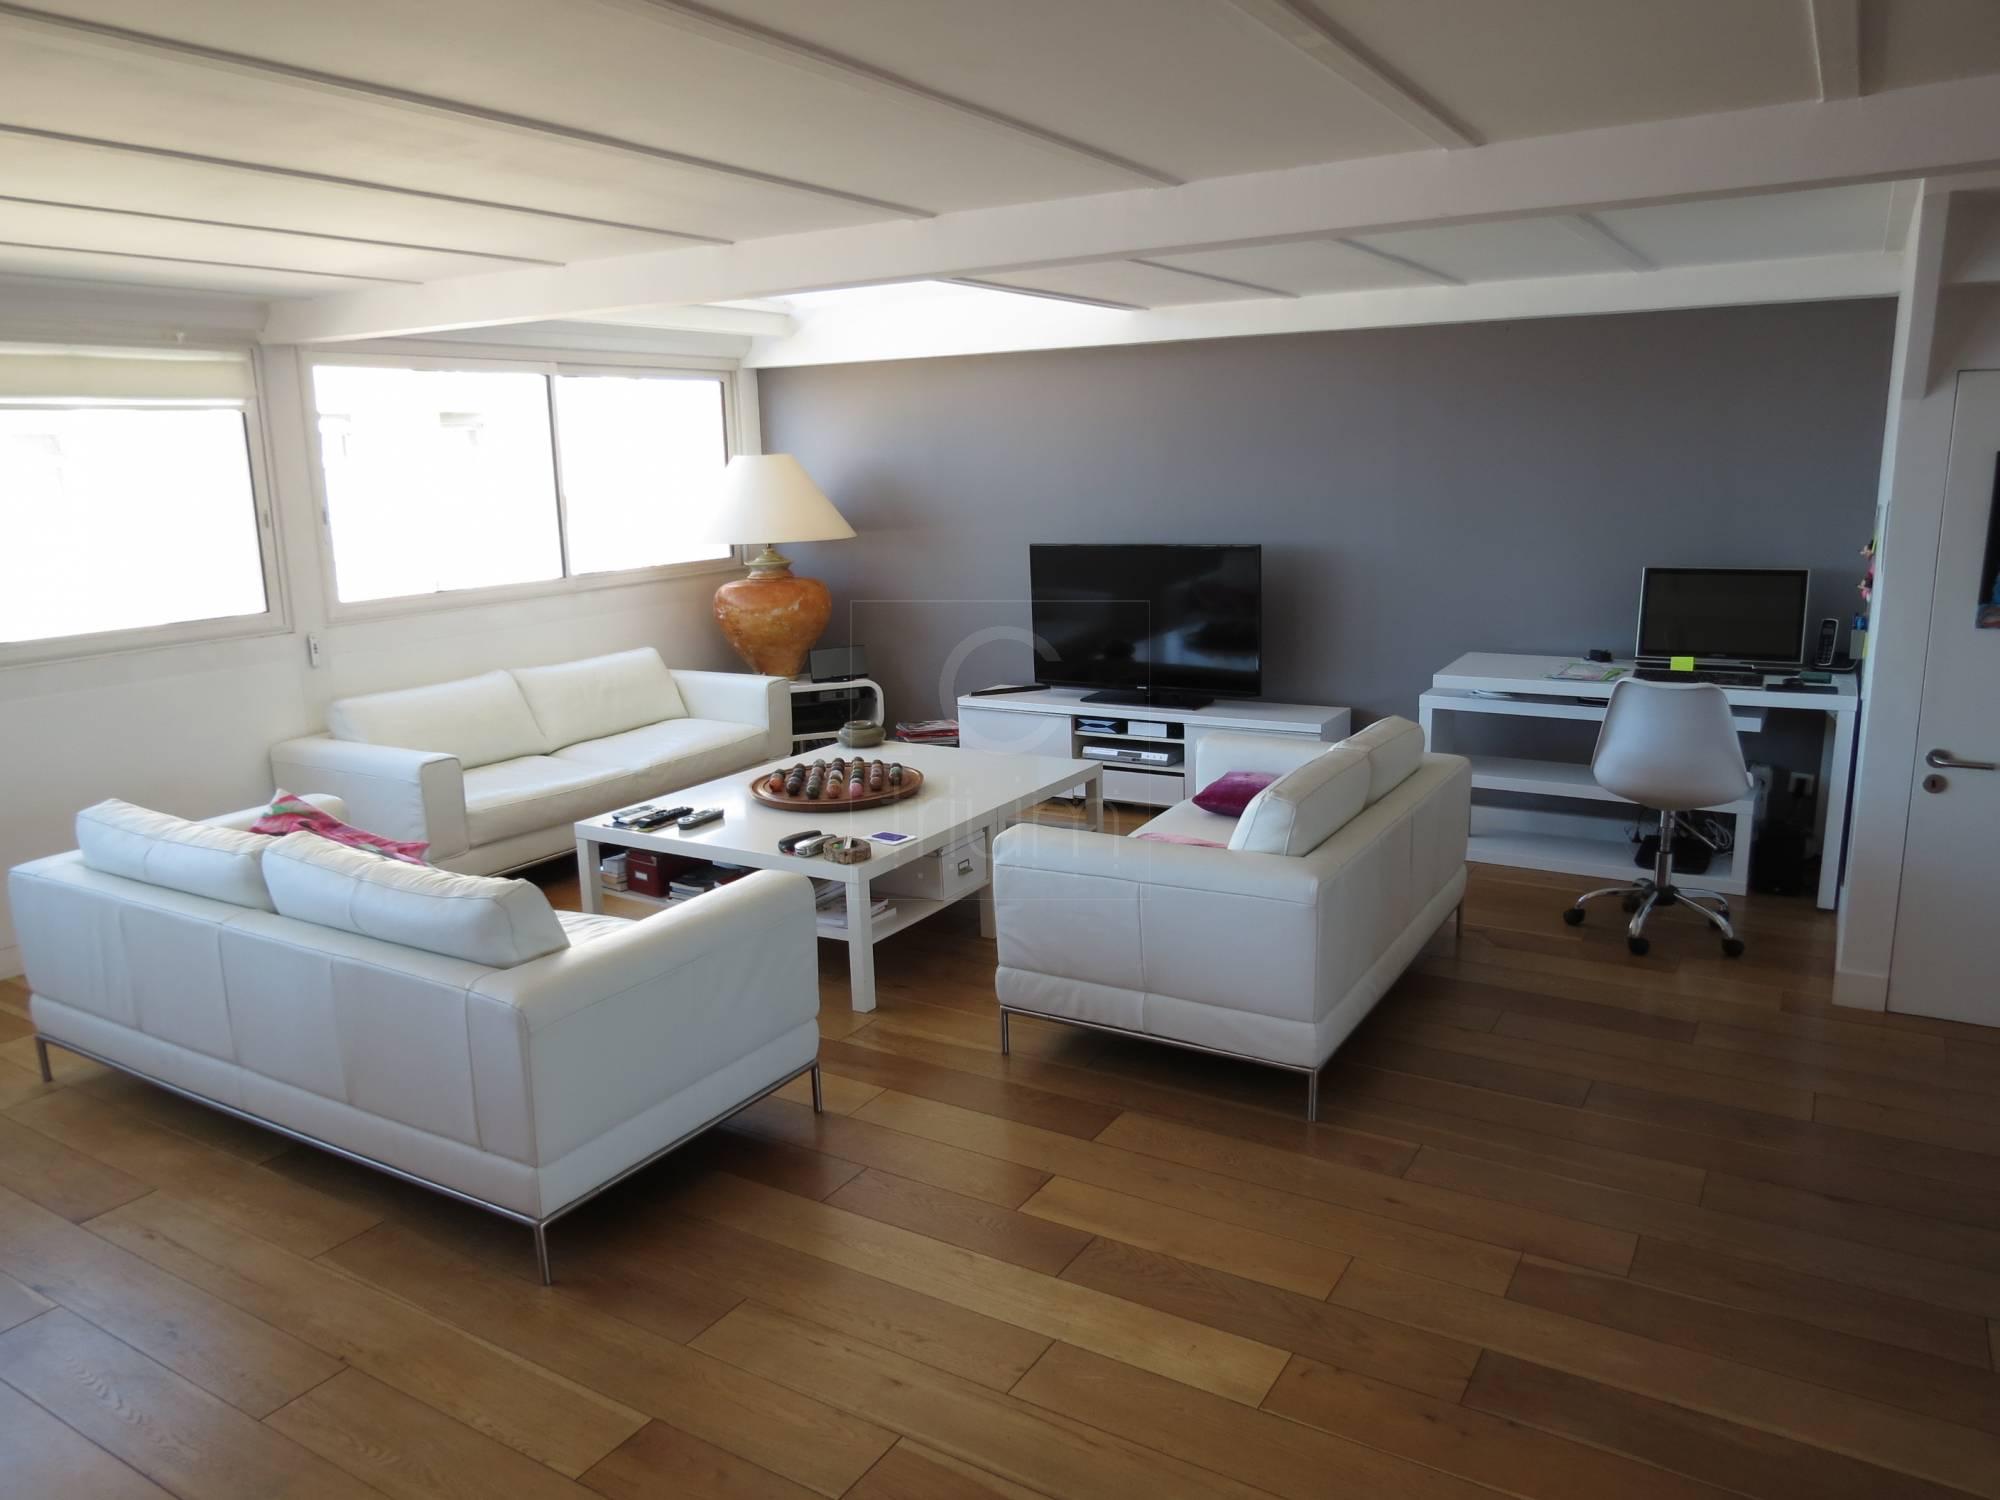 Vente appartement t3 f3 marseille 7eme corniche duplex vue mer agence immobil - Climatisation appartement prix ...